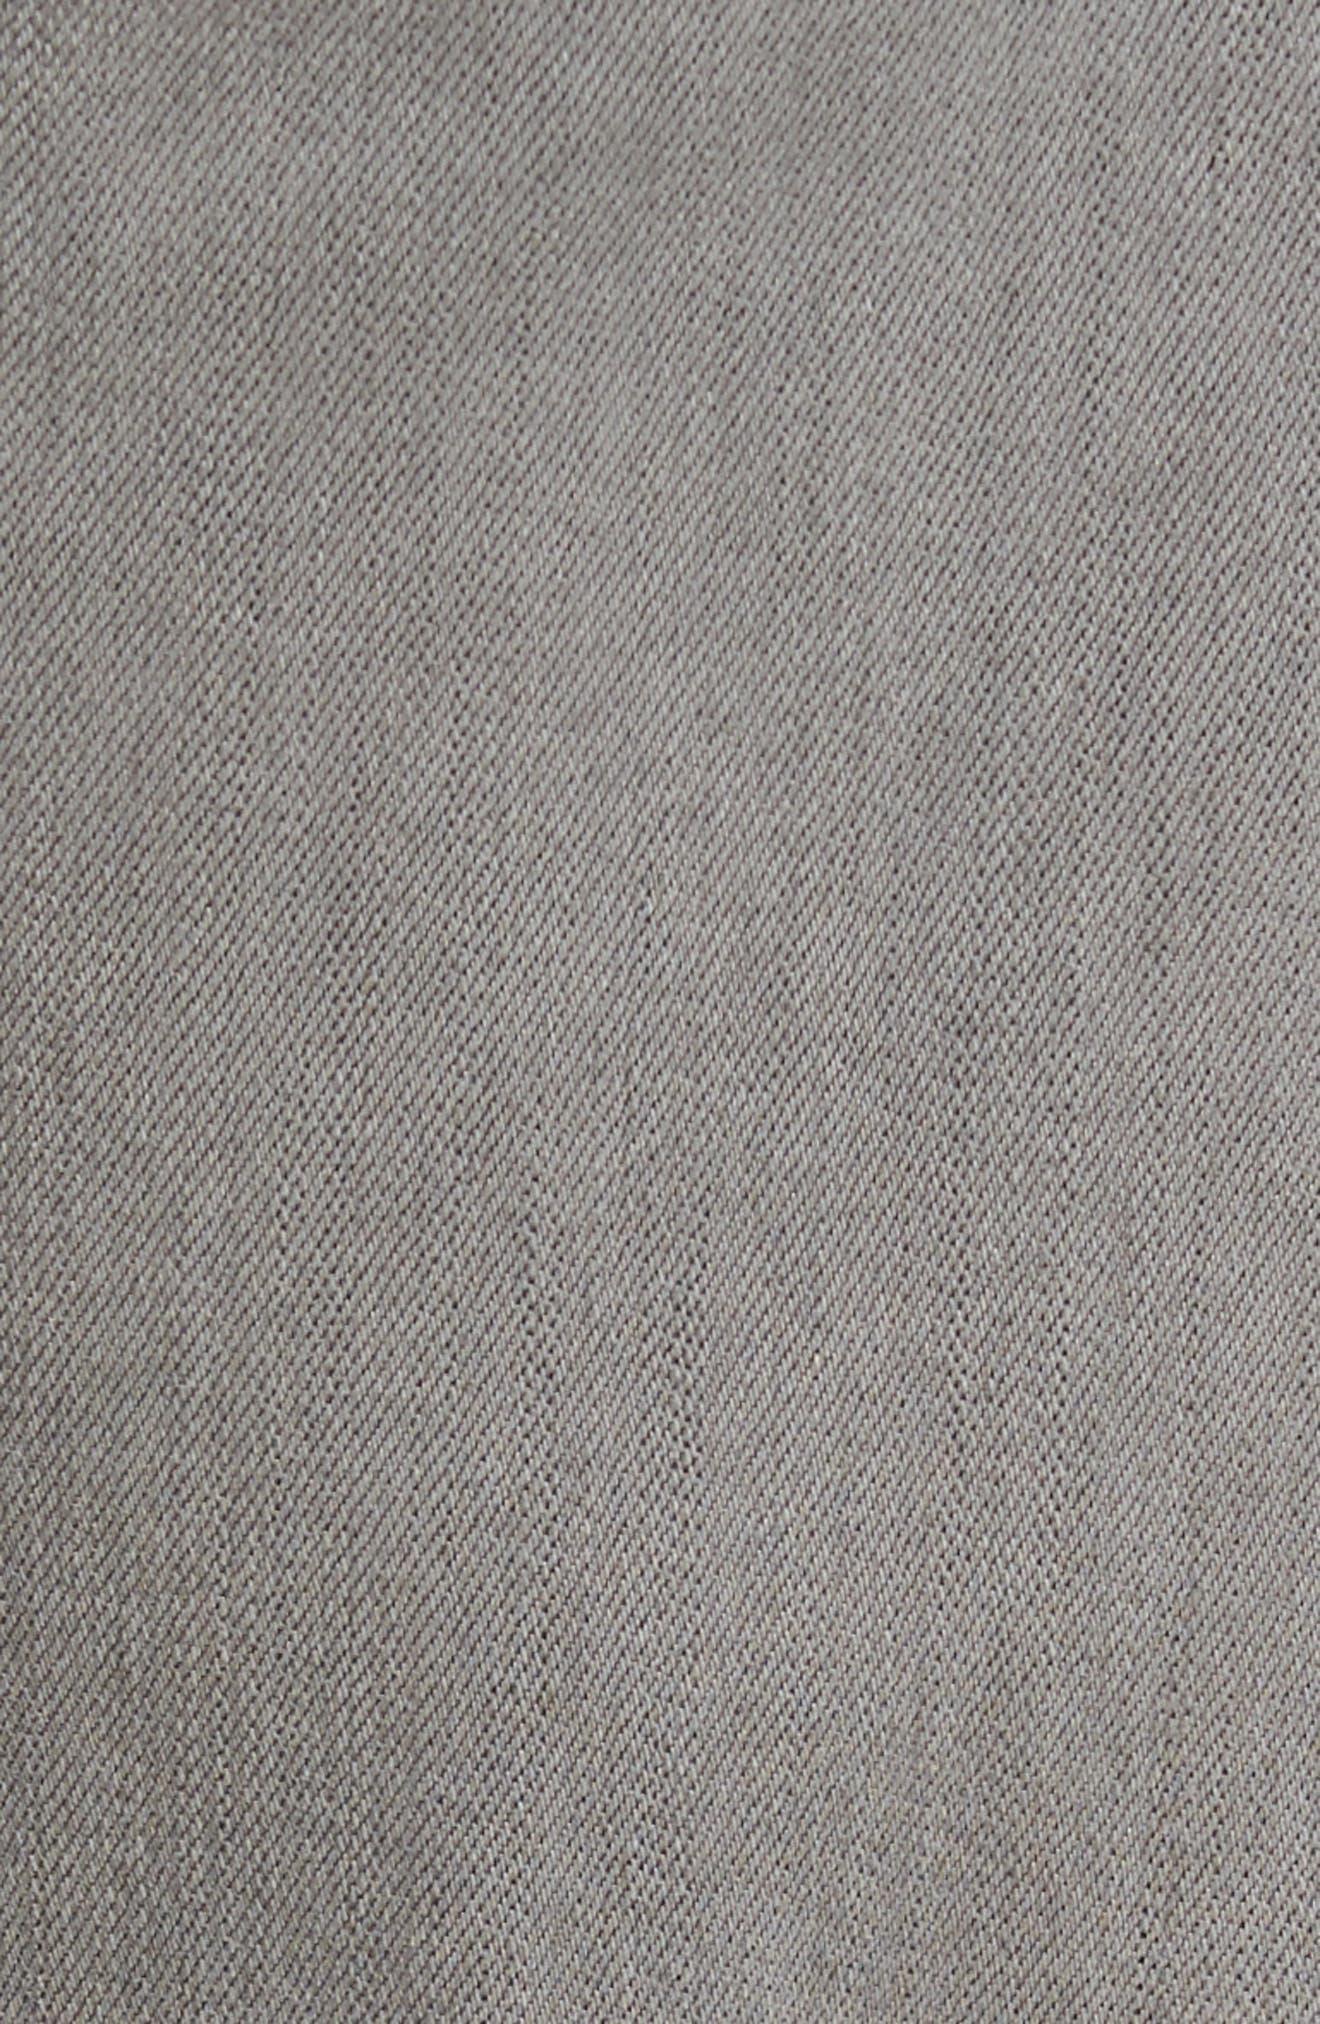 Blake Slim Fit Jeans,                             Alternate thumbnail 5, color,                             023